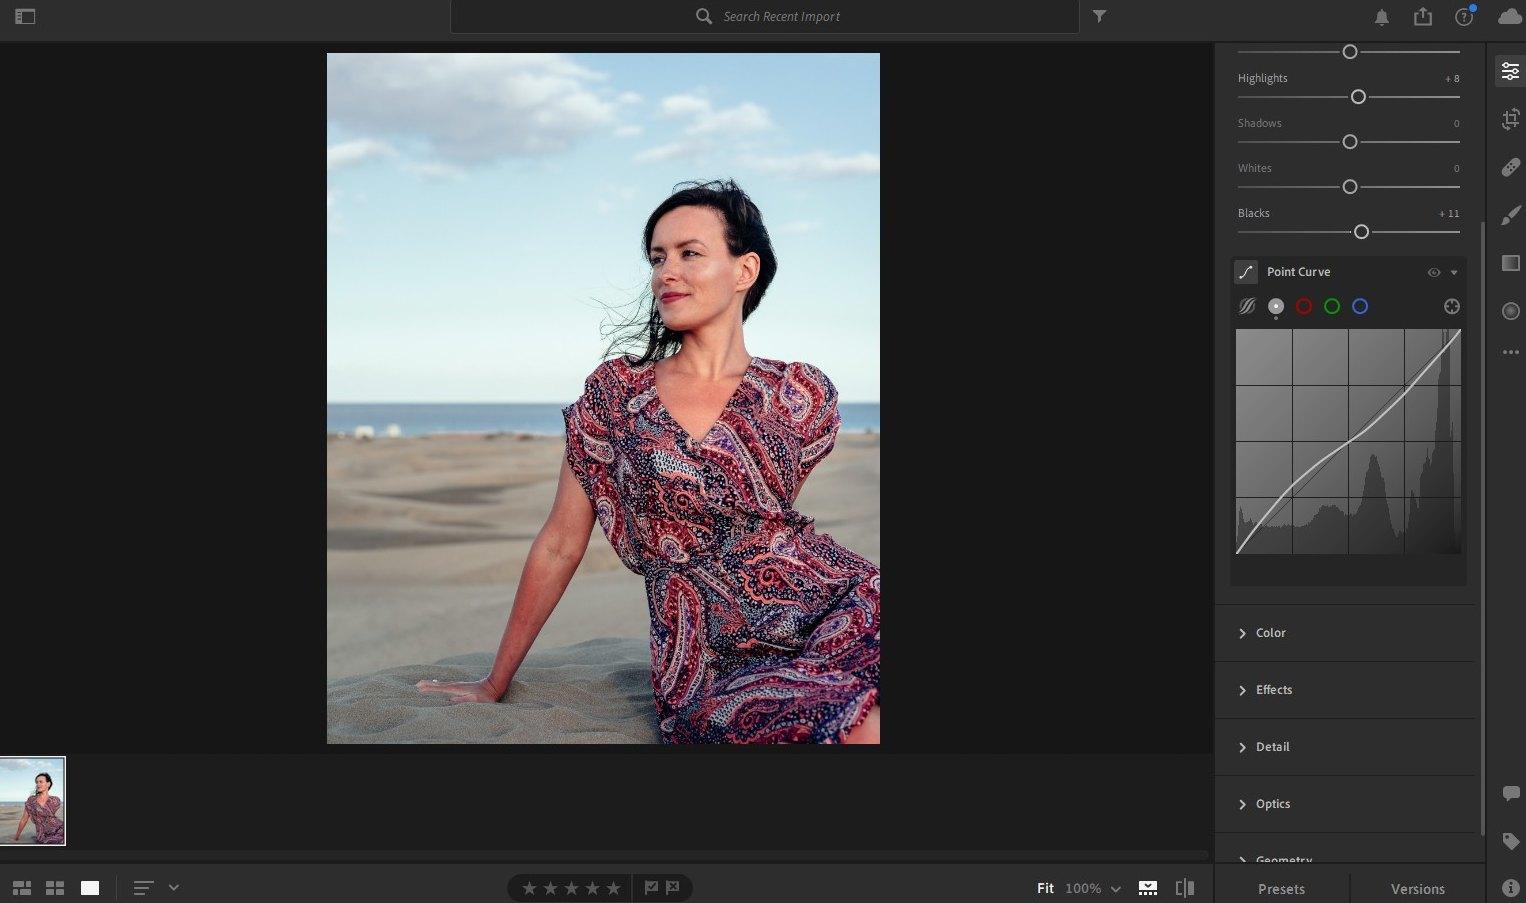 lightroom portrait editing - point curve